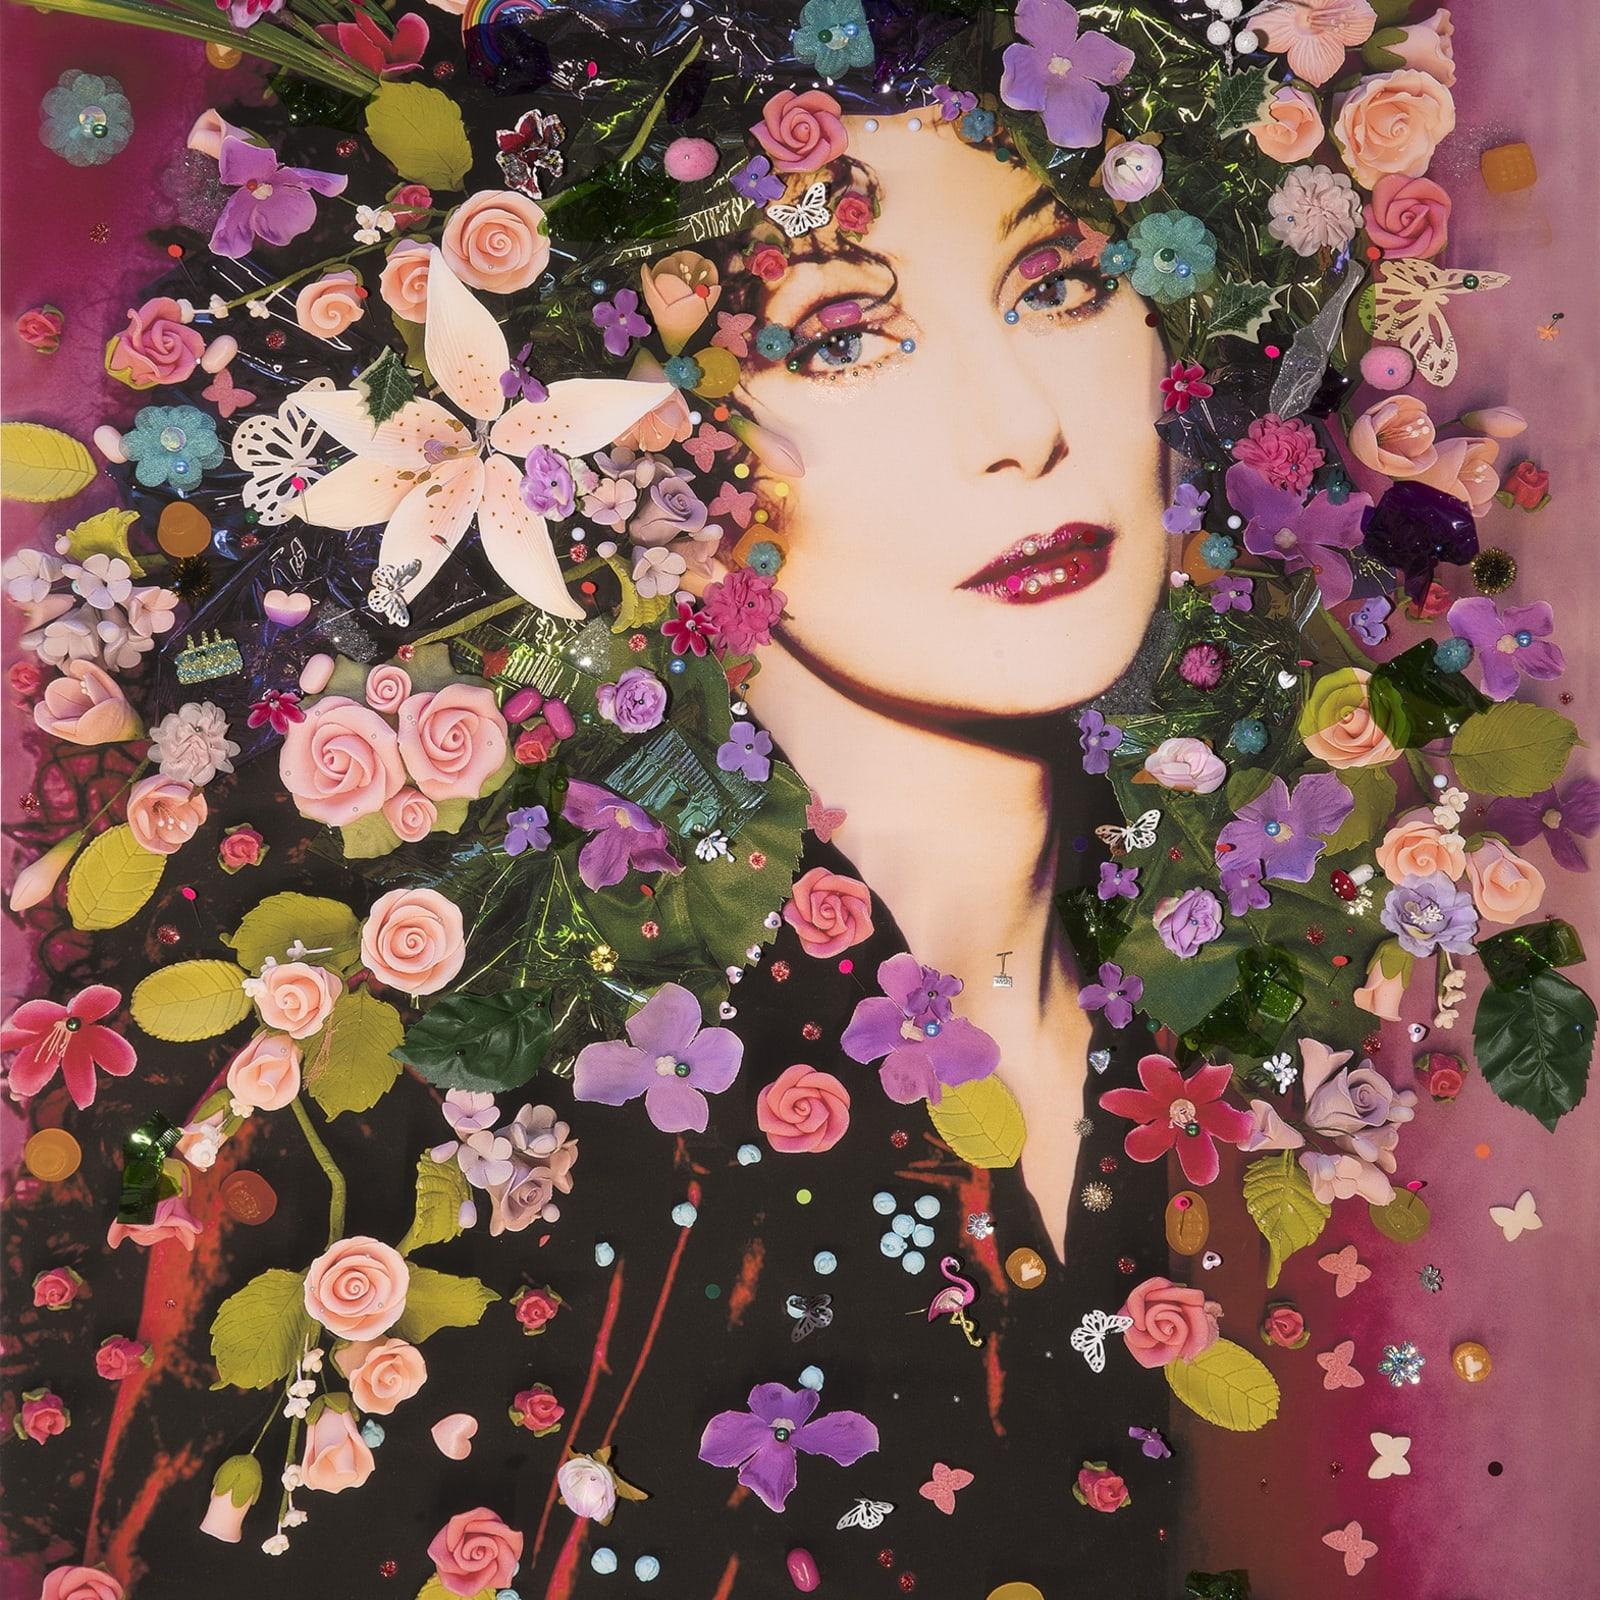 Cher - Meta-Portrait